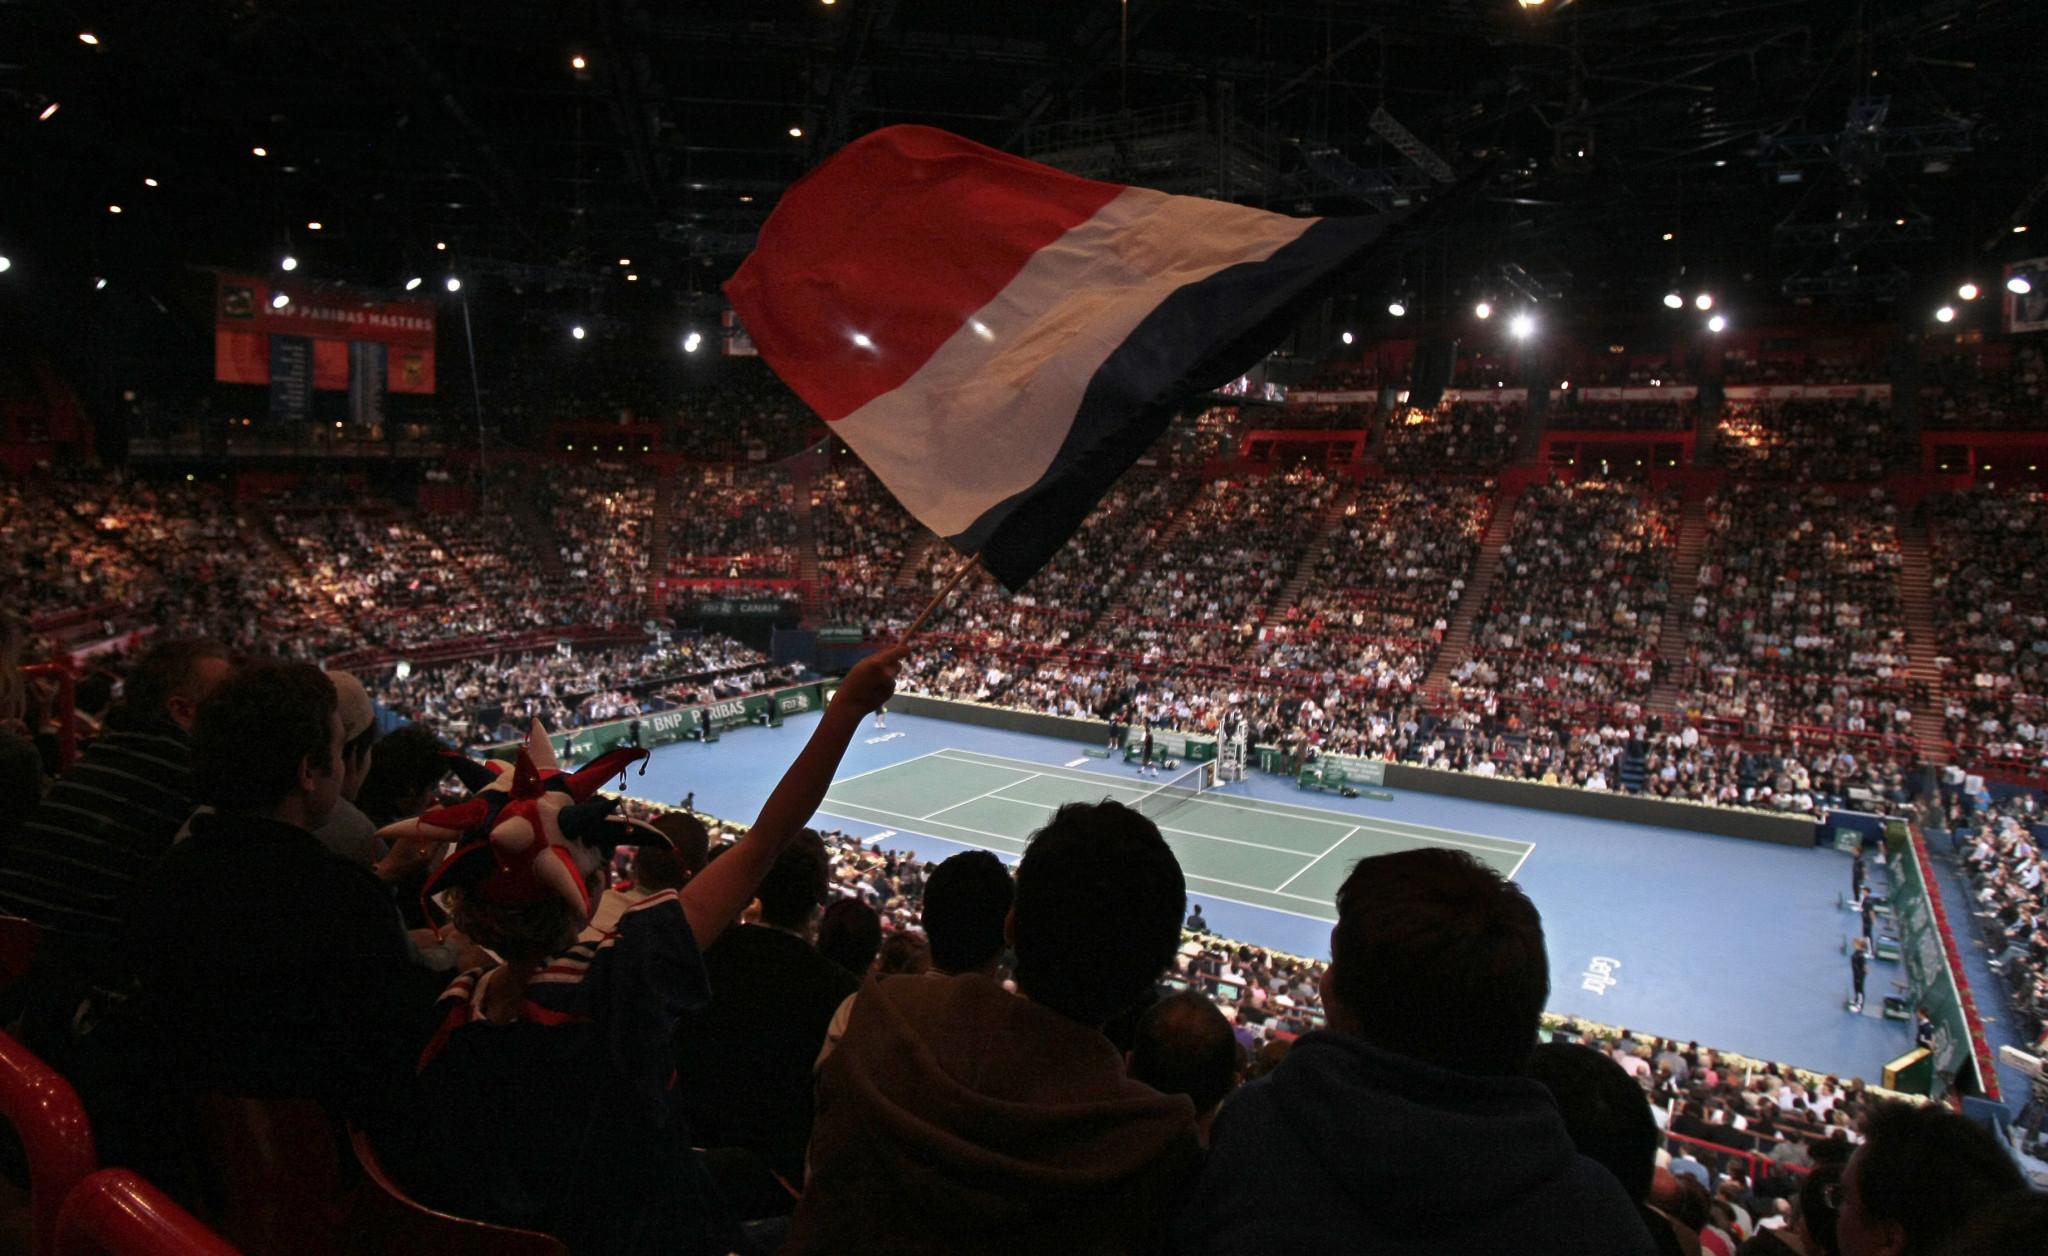 Global Sports Week announces Paris 2024 venue as host for 2022 edition